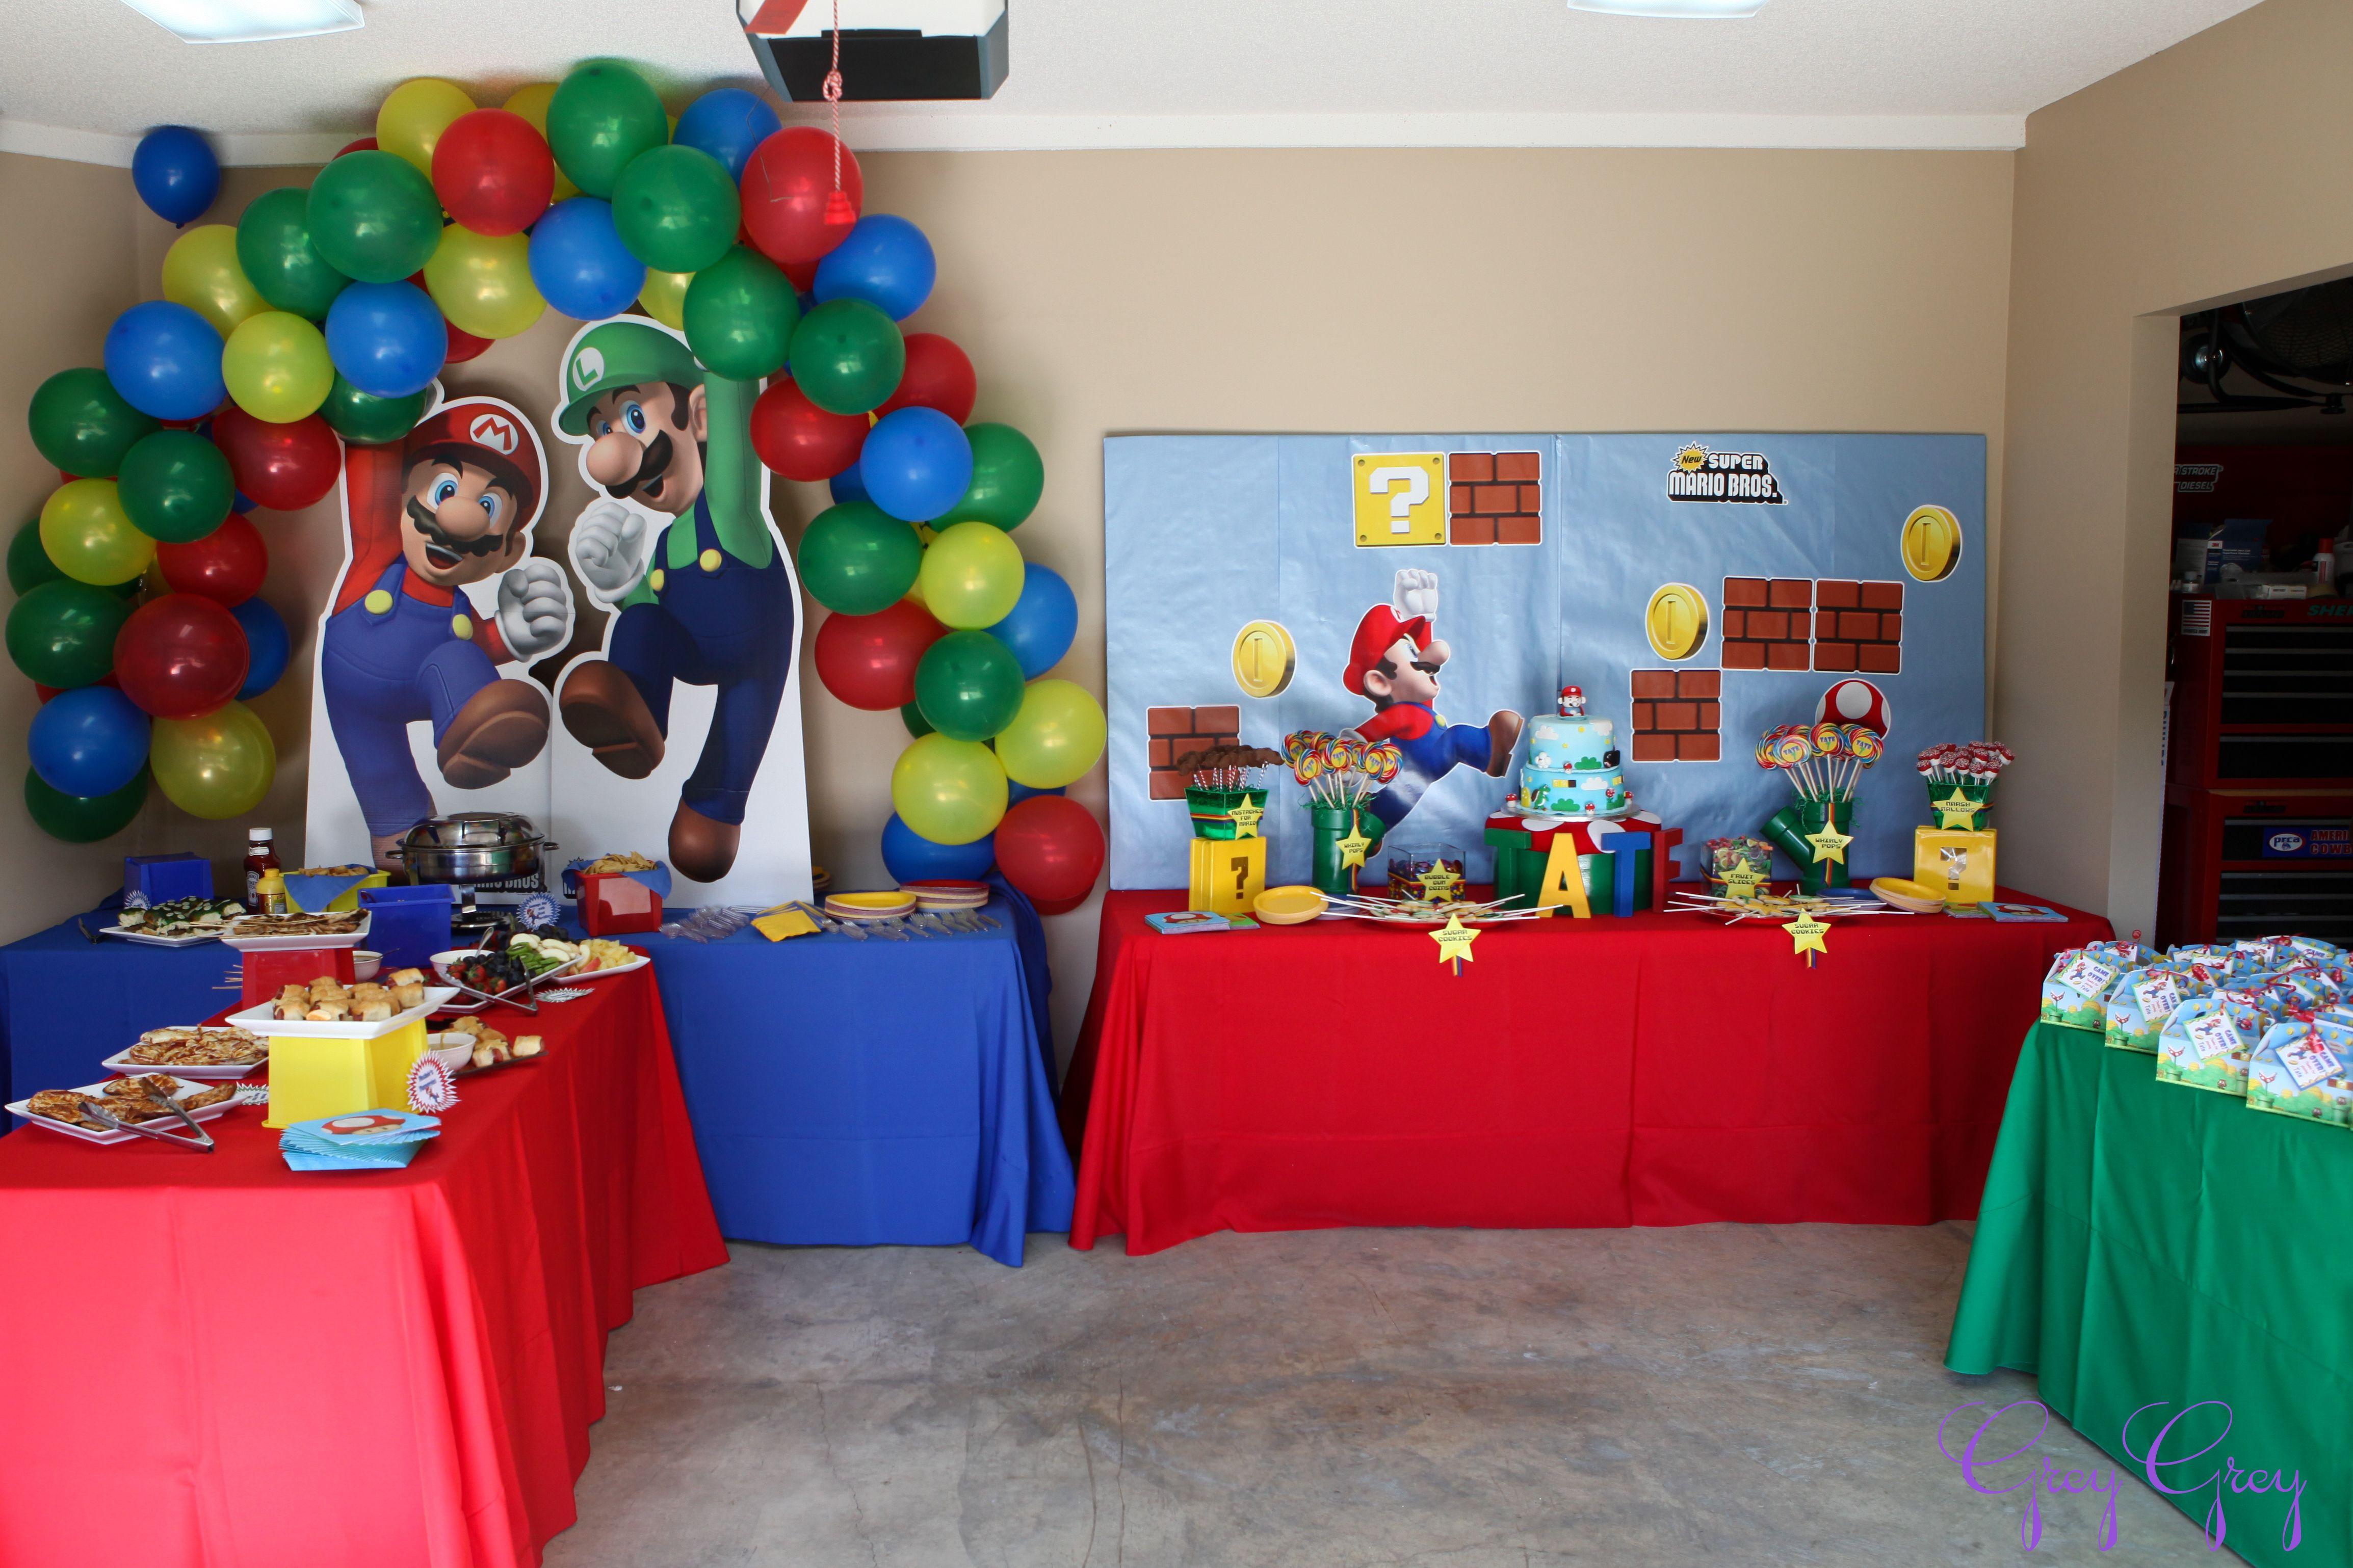 Birthday Party Ideas Photo 2 Of 38 Mario Bros Birthday Party Ideas Super Mario Bros Birthday Party Mario Bros Birthday